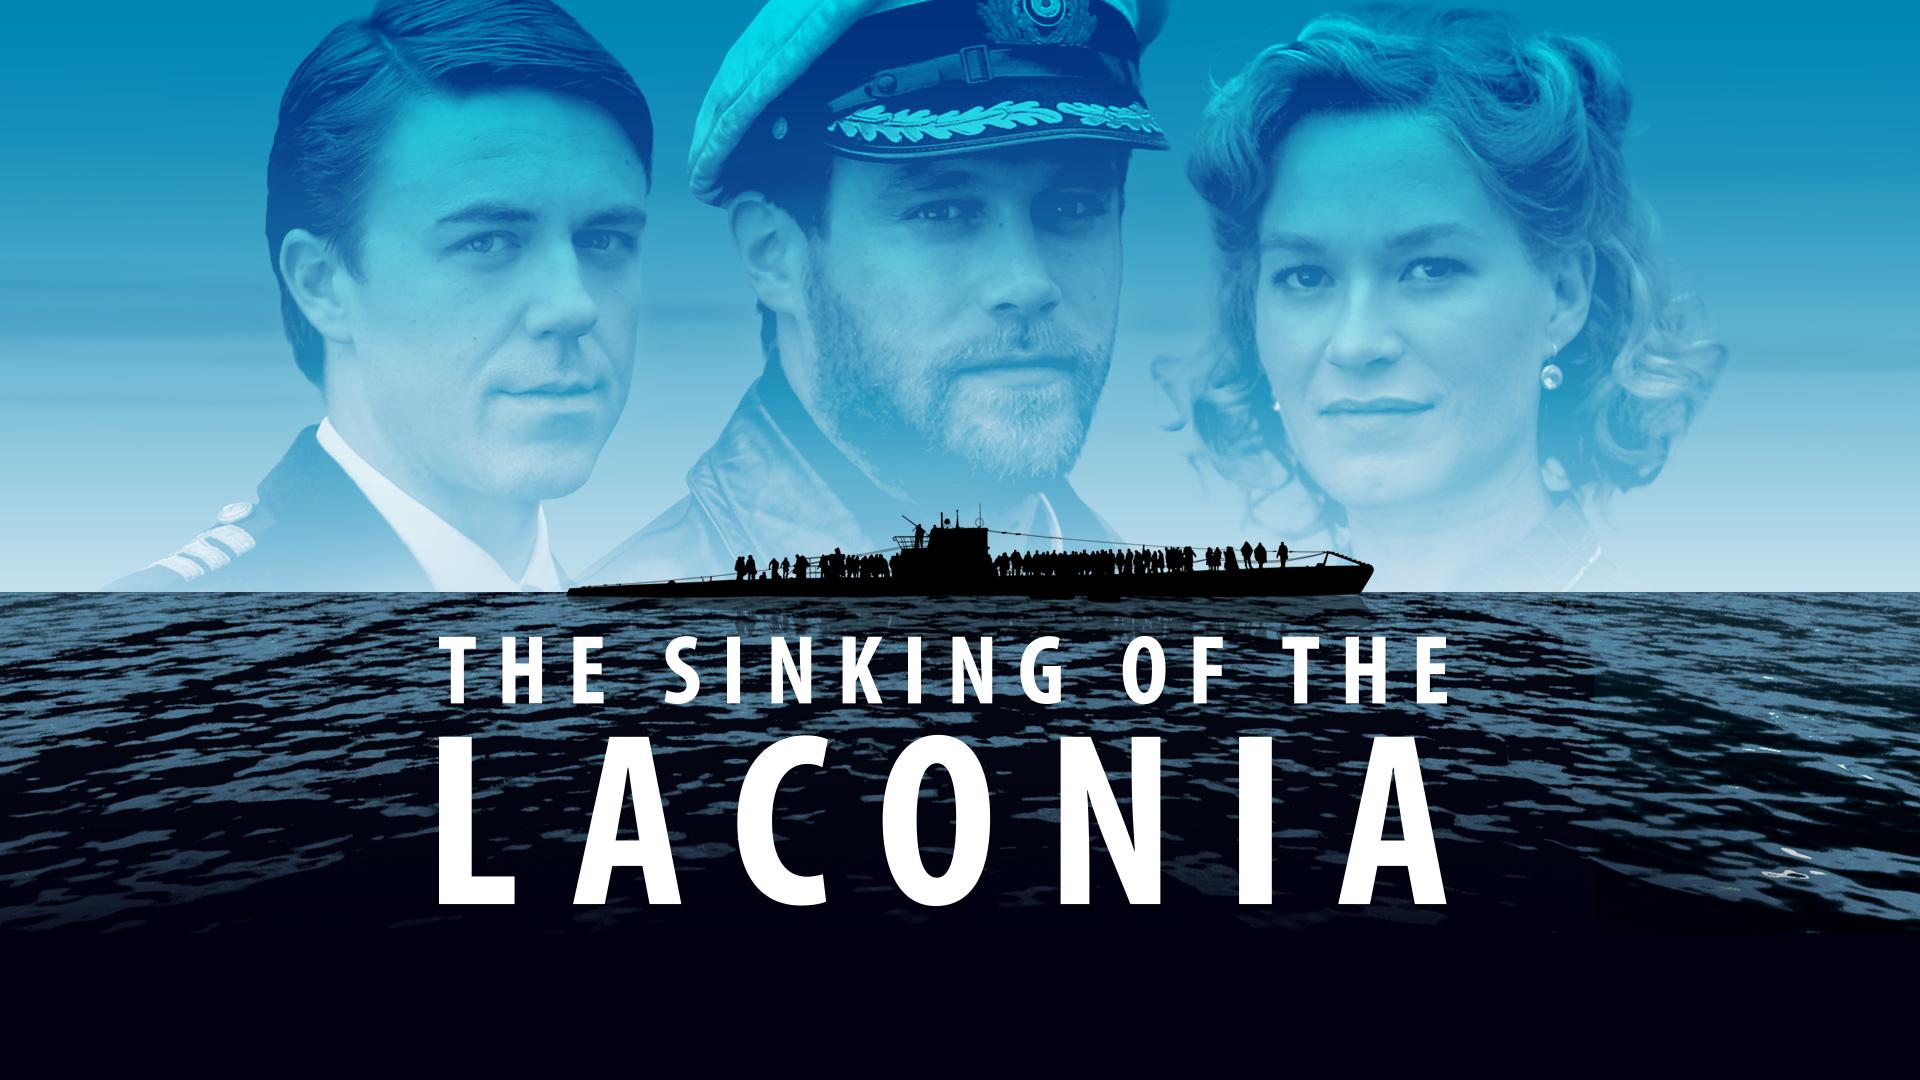 The Sinking of the Laconia Season 1